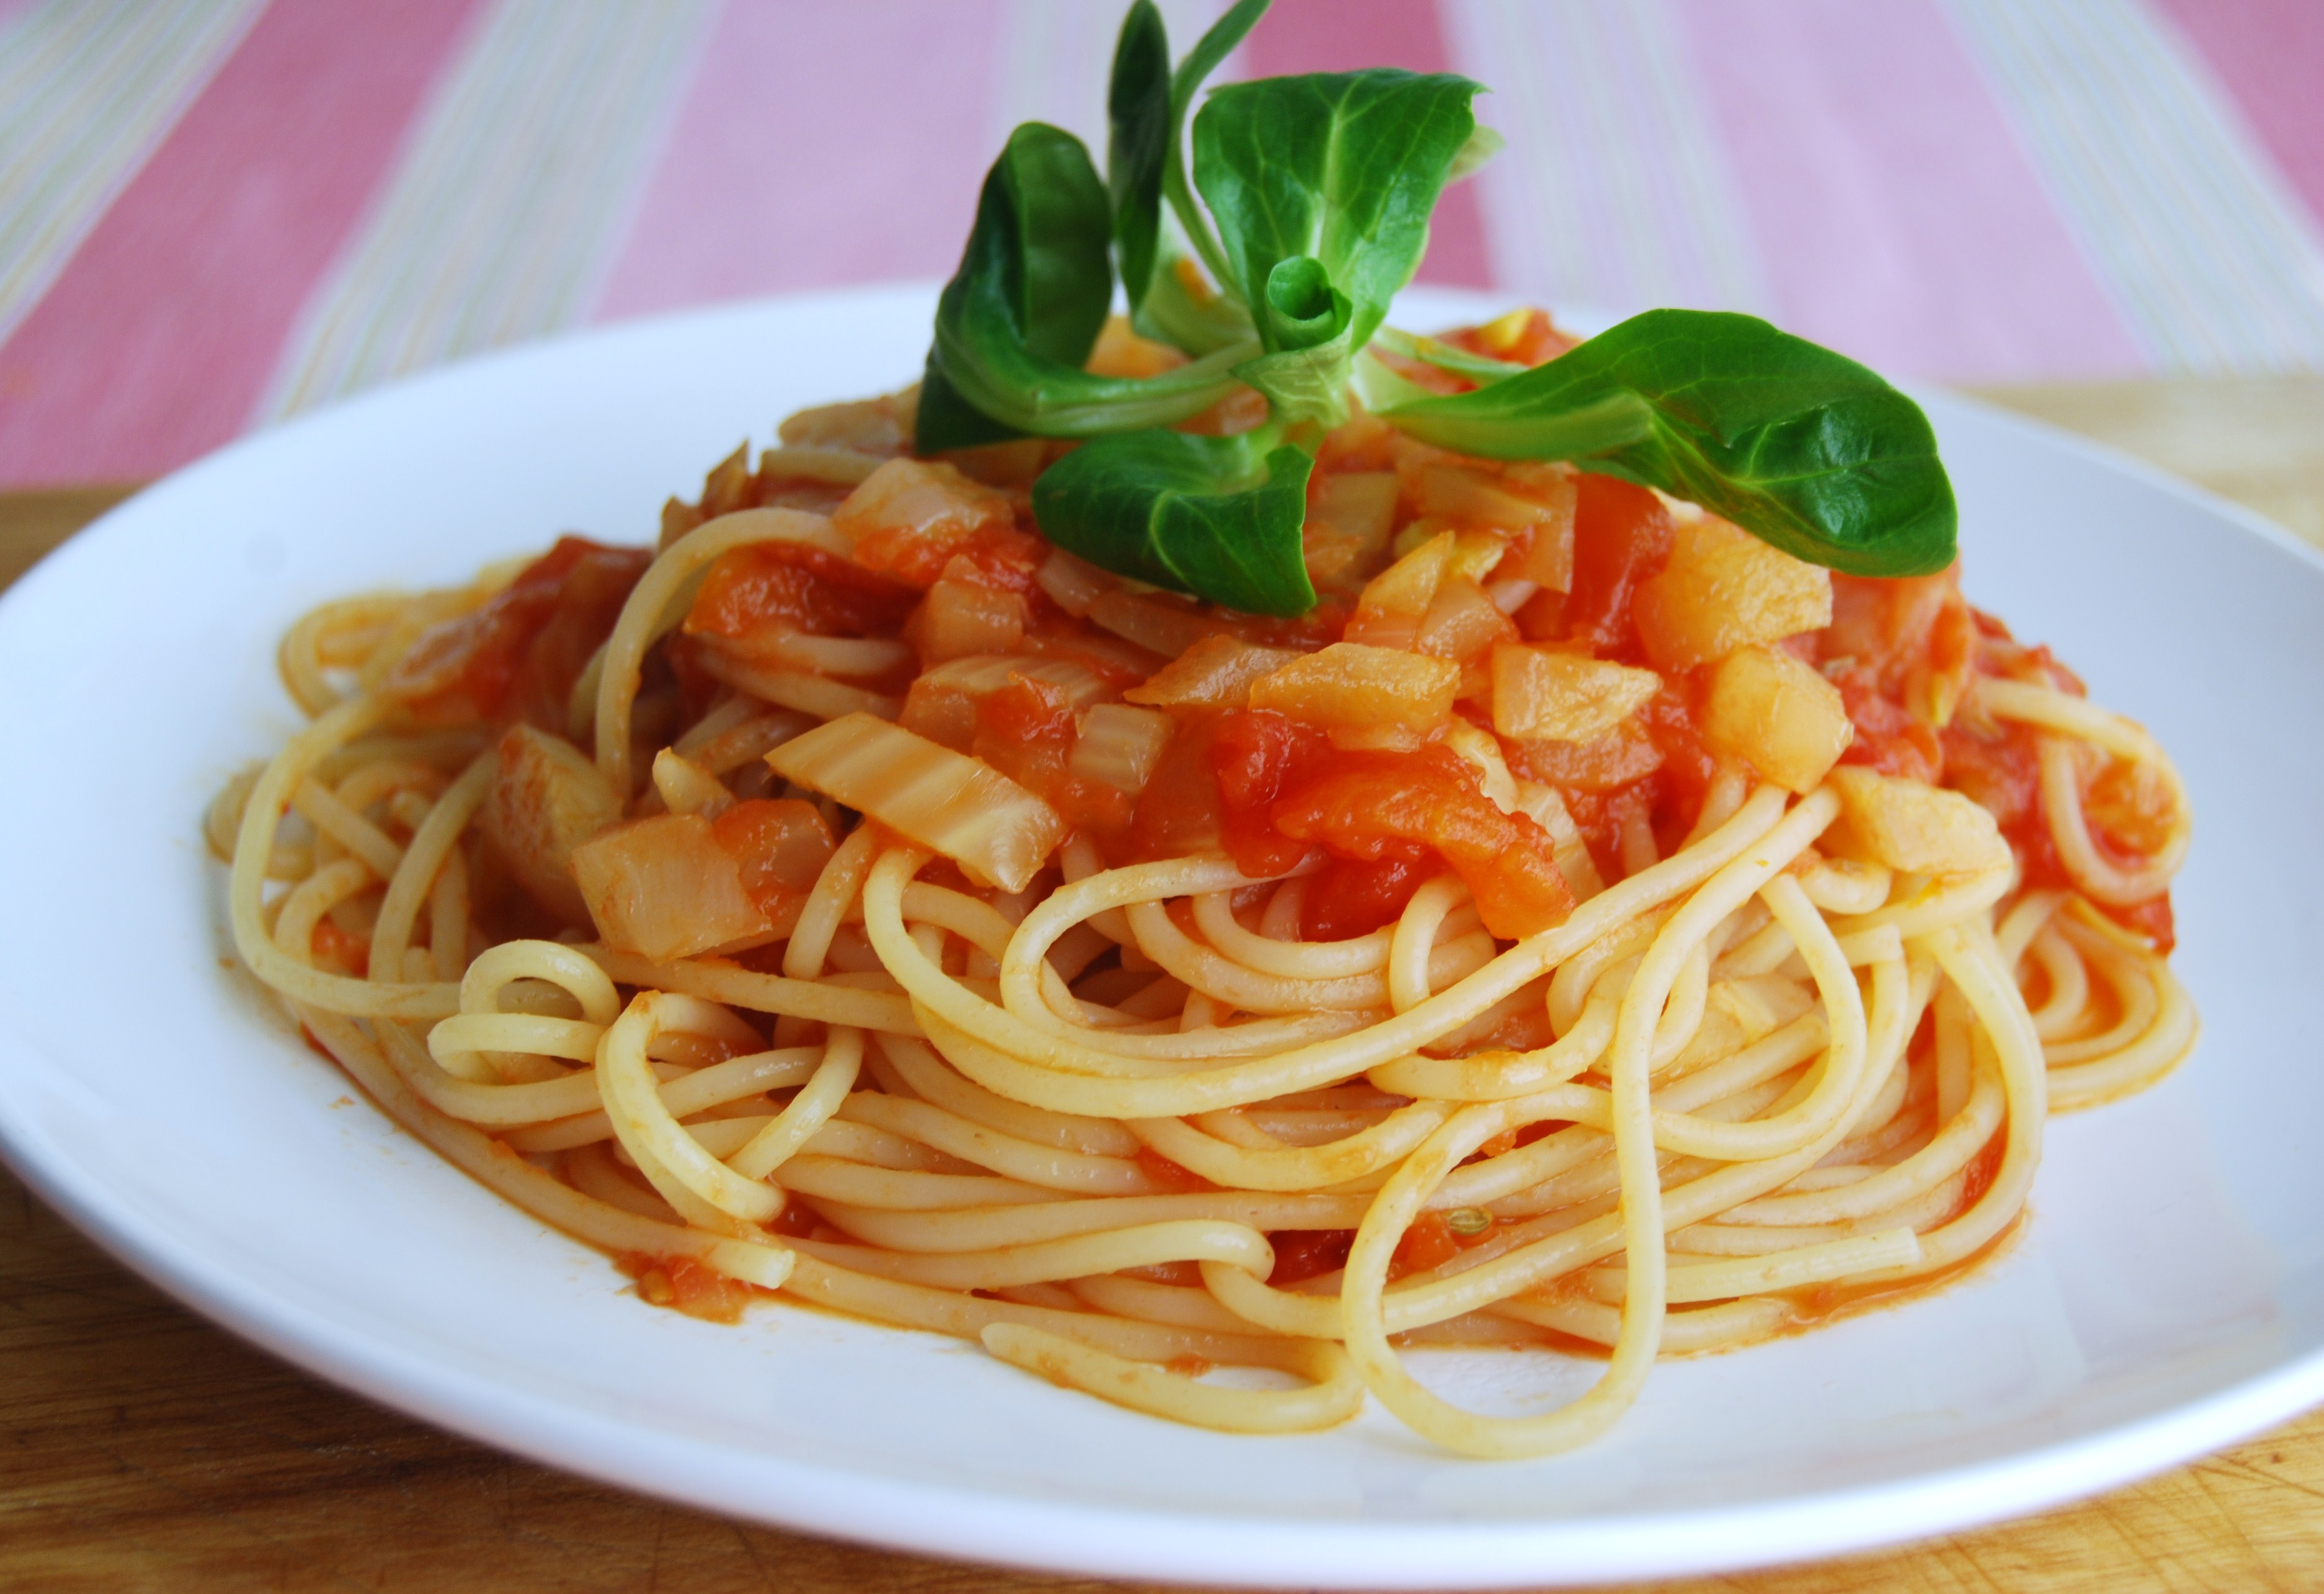 Pasta Salad Recipes Types Primavera Bake Fagioli Carbonara